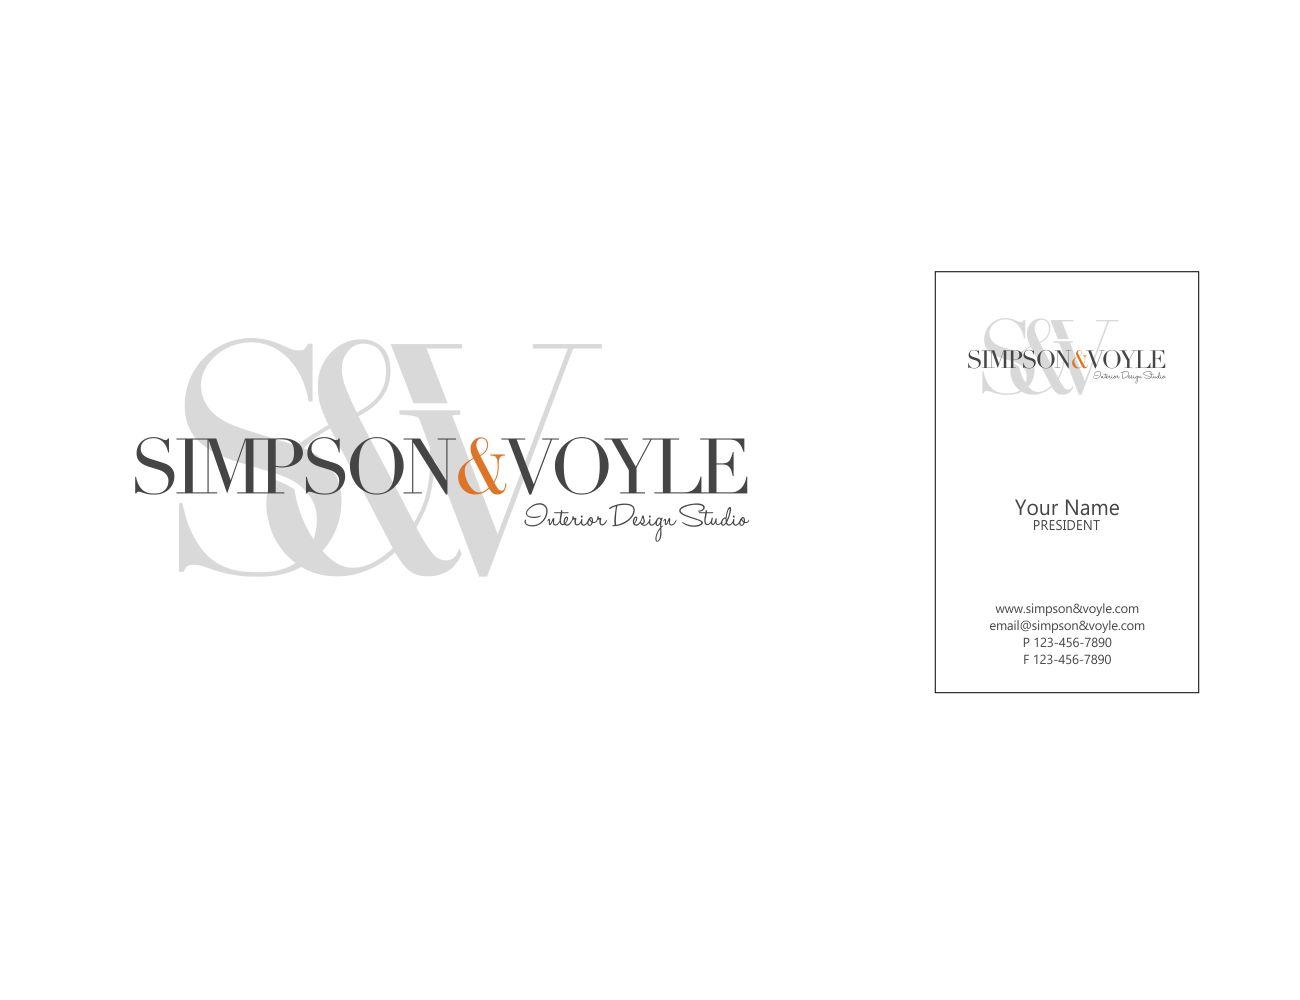 Upmarket Playful It Company Logo Design For Simpson Voyle Interior Design Studio By Edu Morente Design 17366261